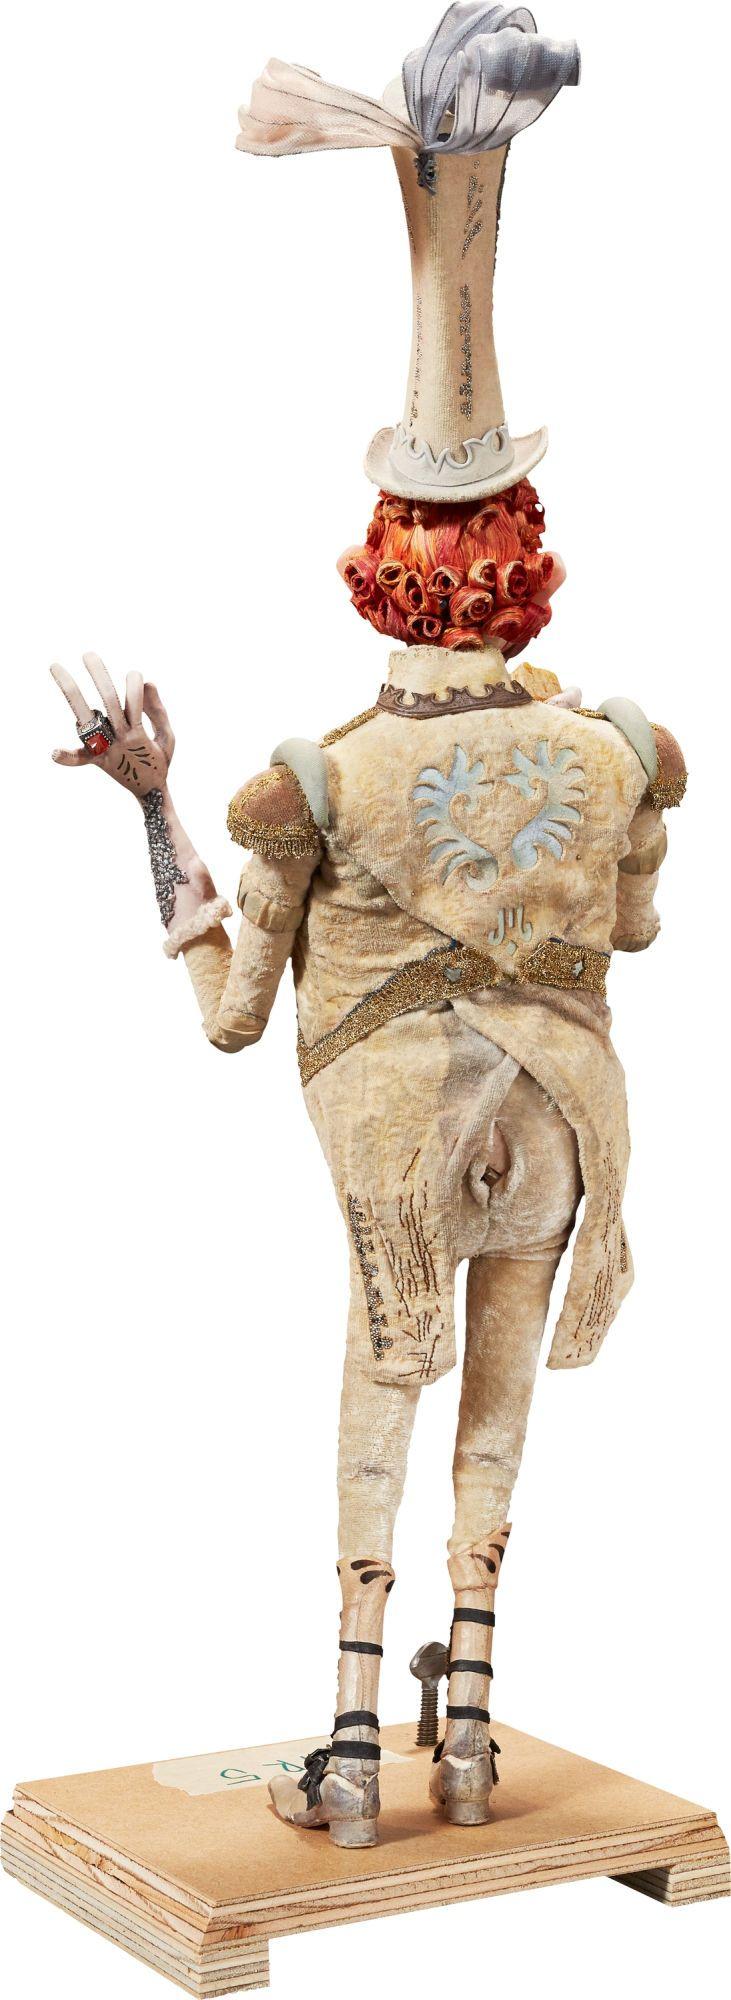 Animation Art:Puppet, The Boxtrolls Lord Portley-Rind Original Animation Puppet(LAIKA, 2014)....